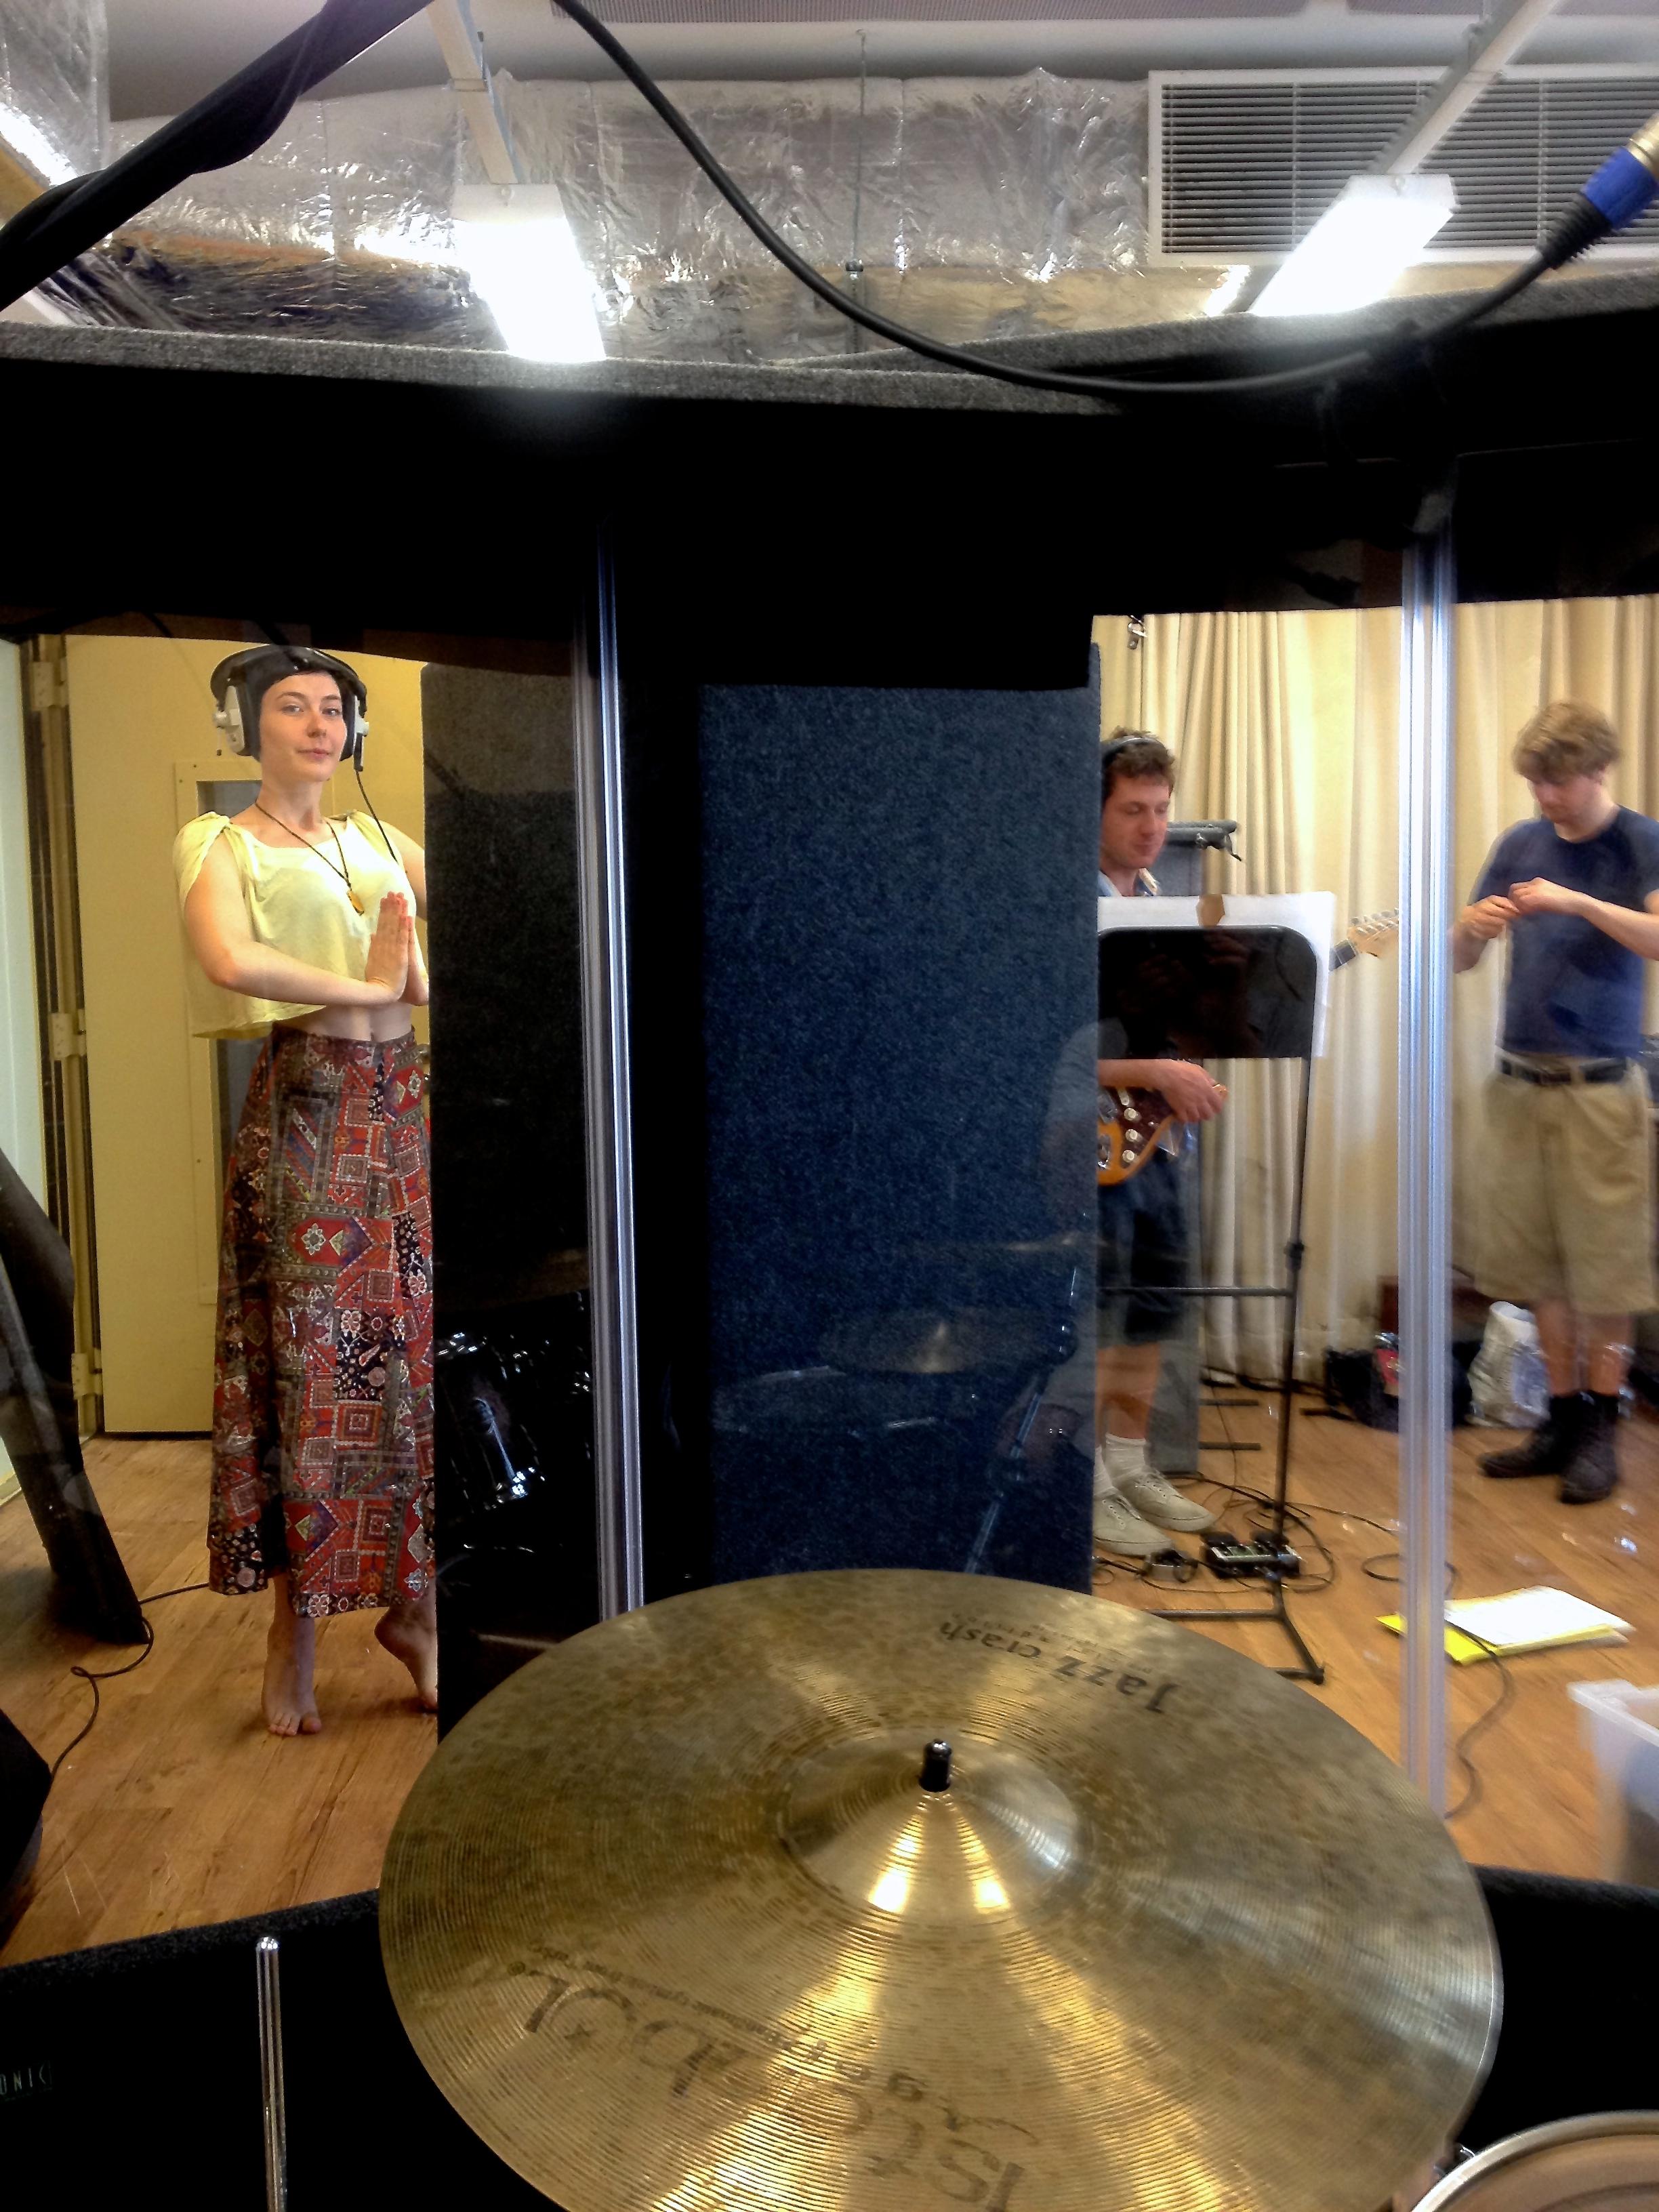 Telajeta Recording